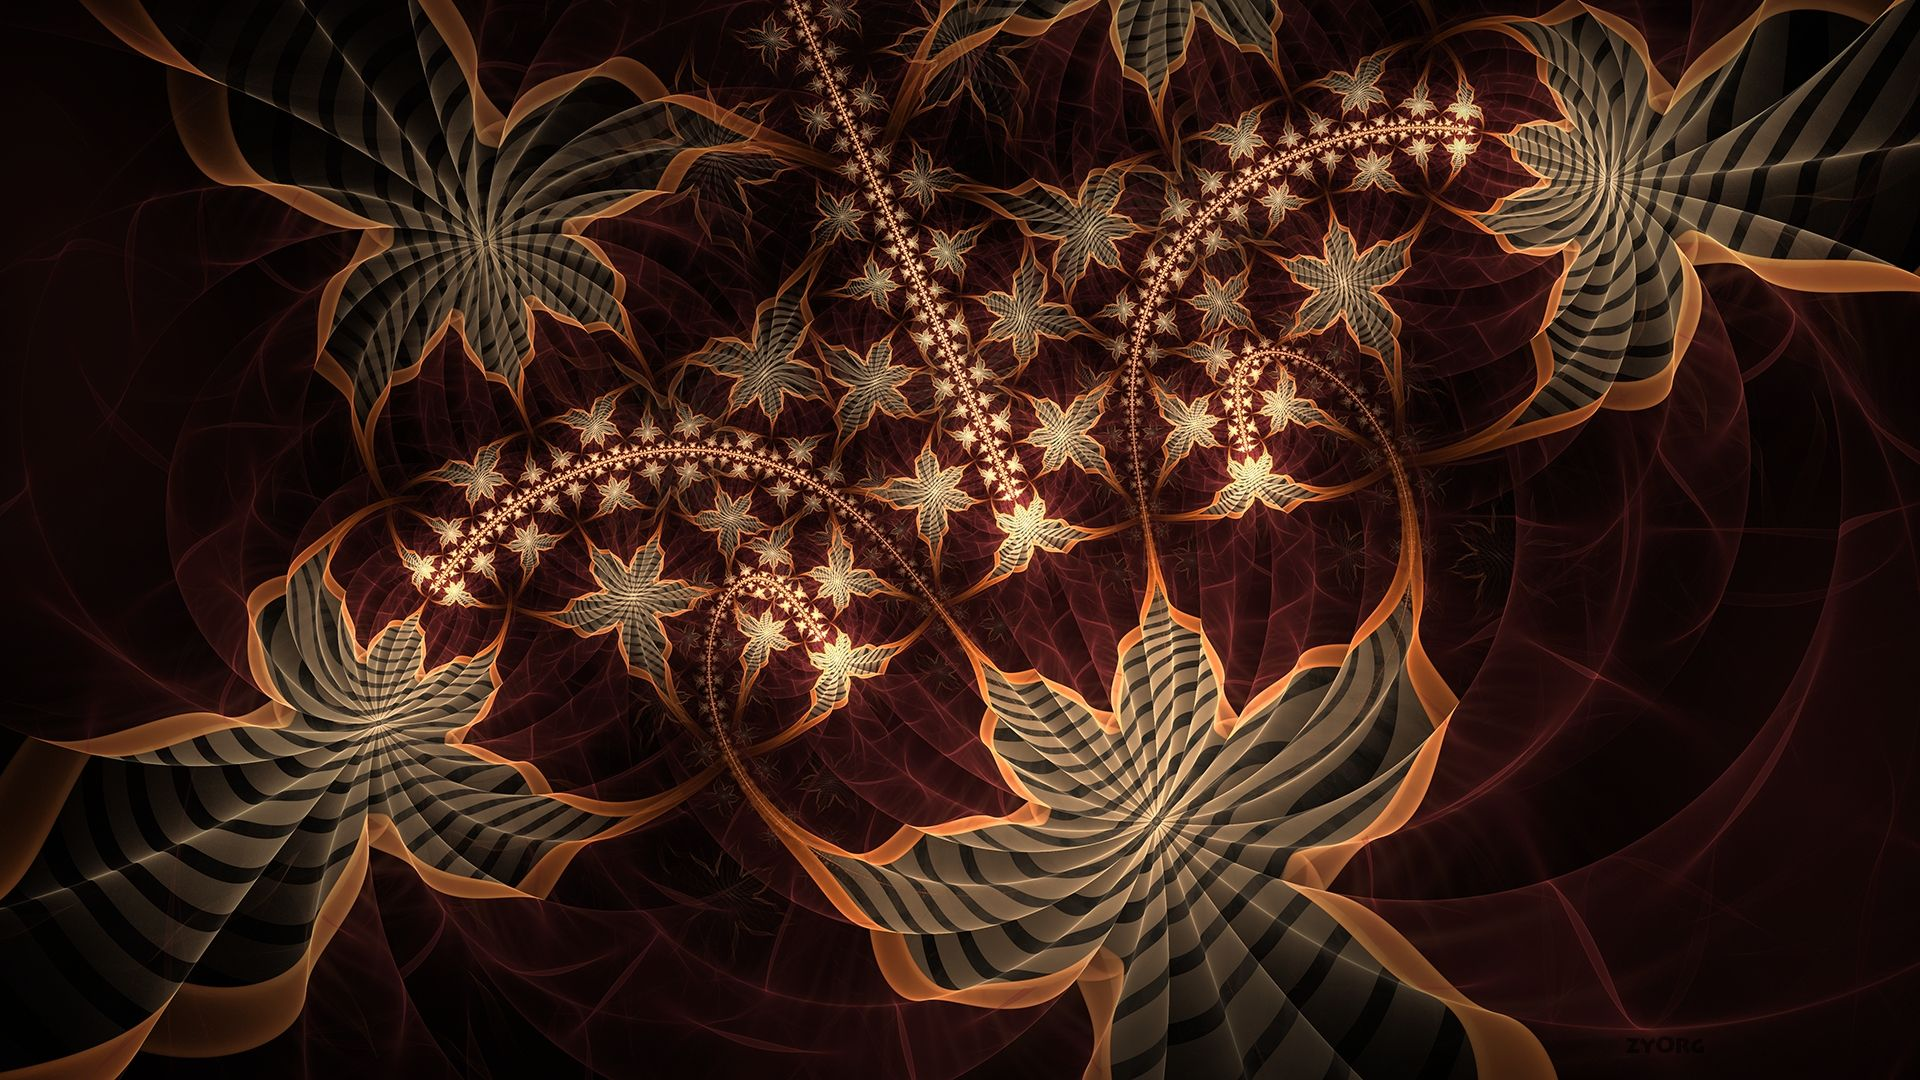 fractals - Google Search